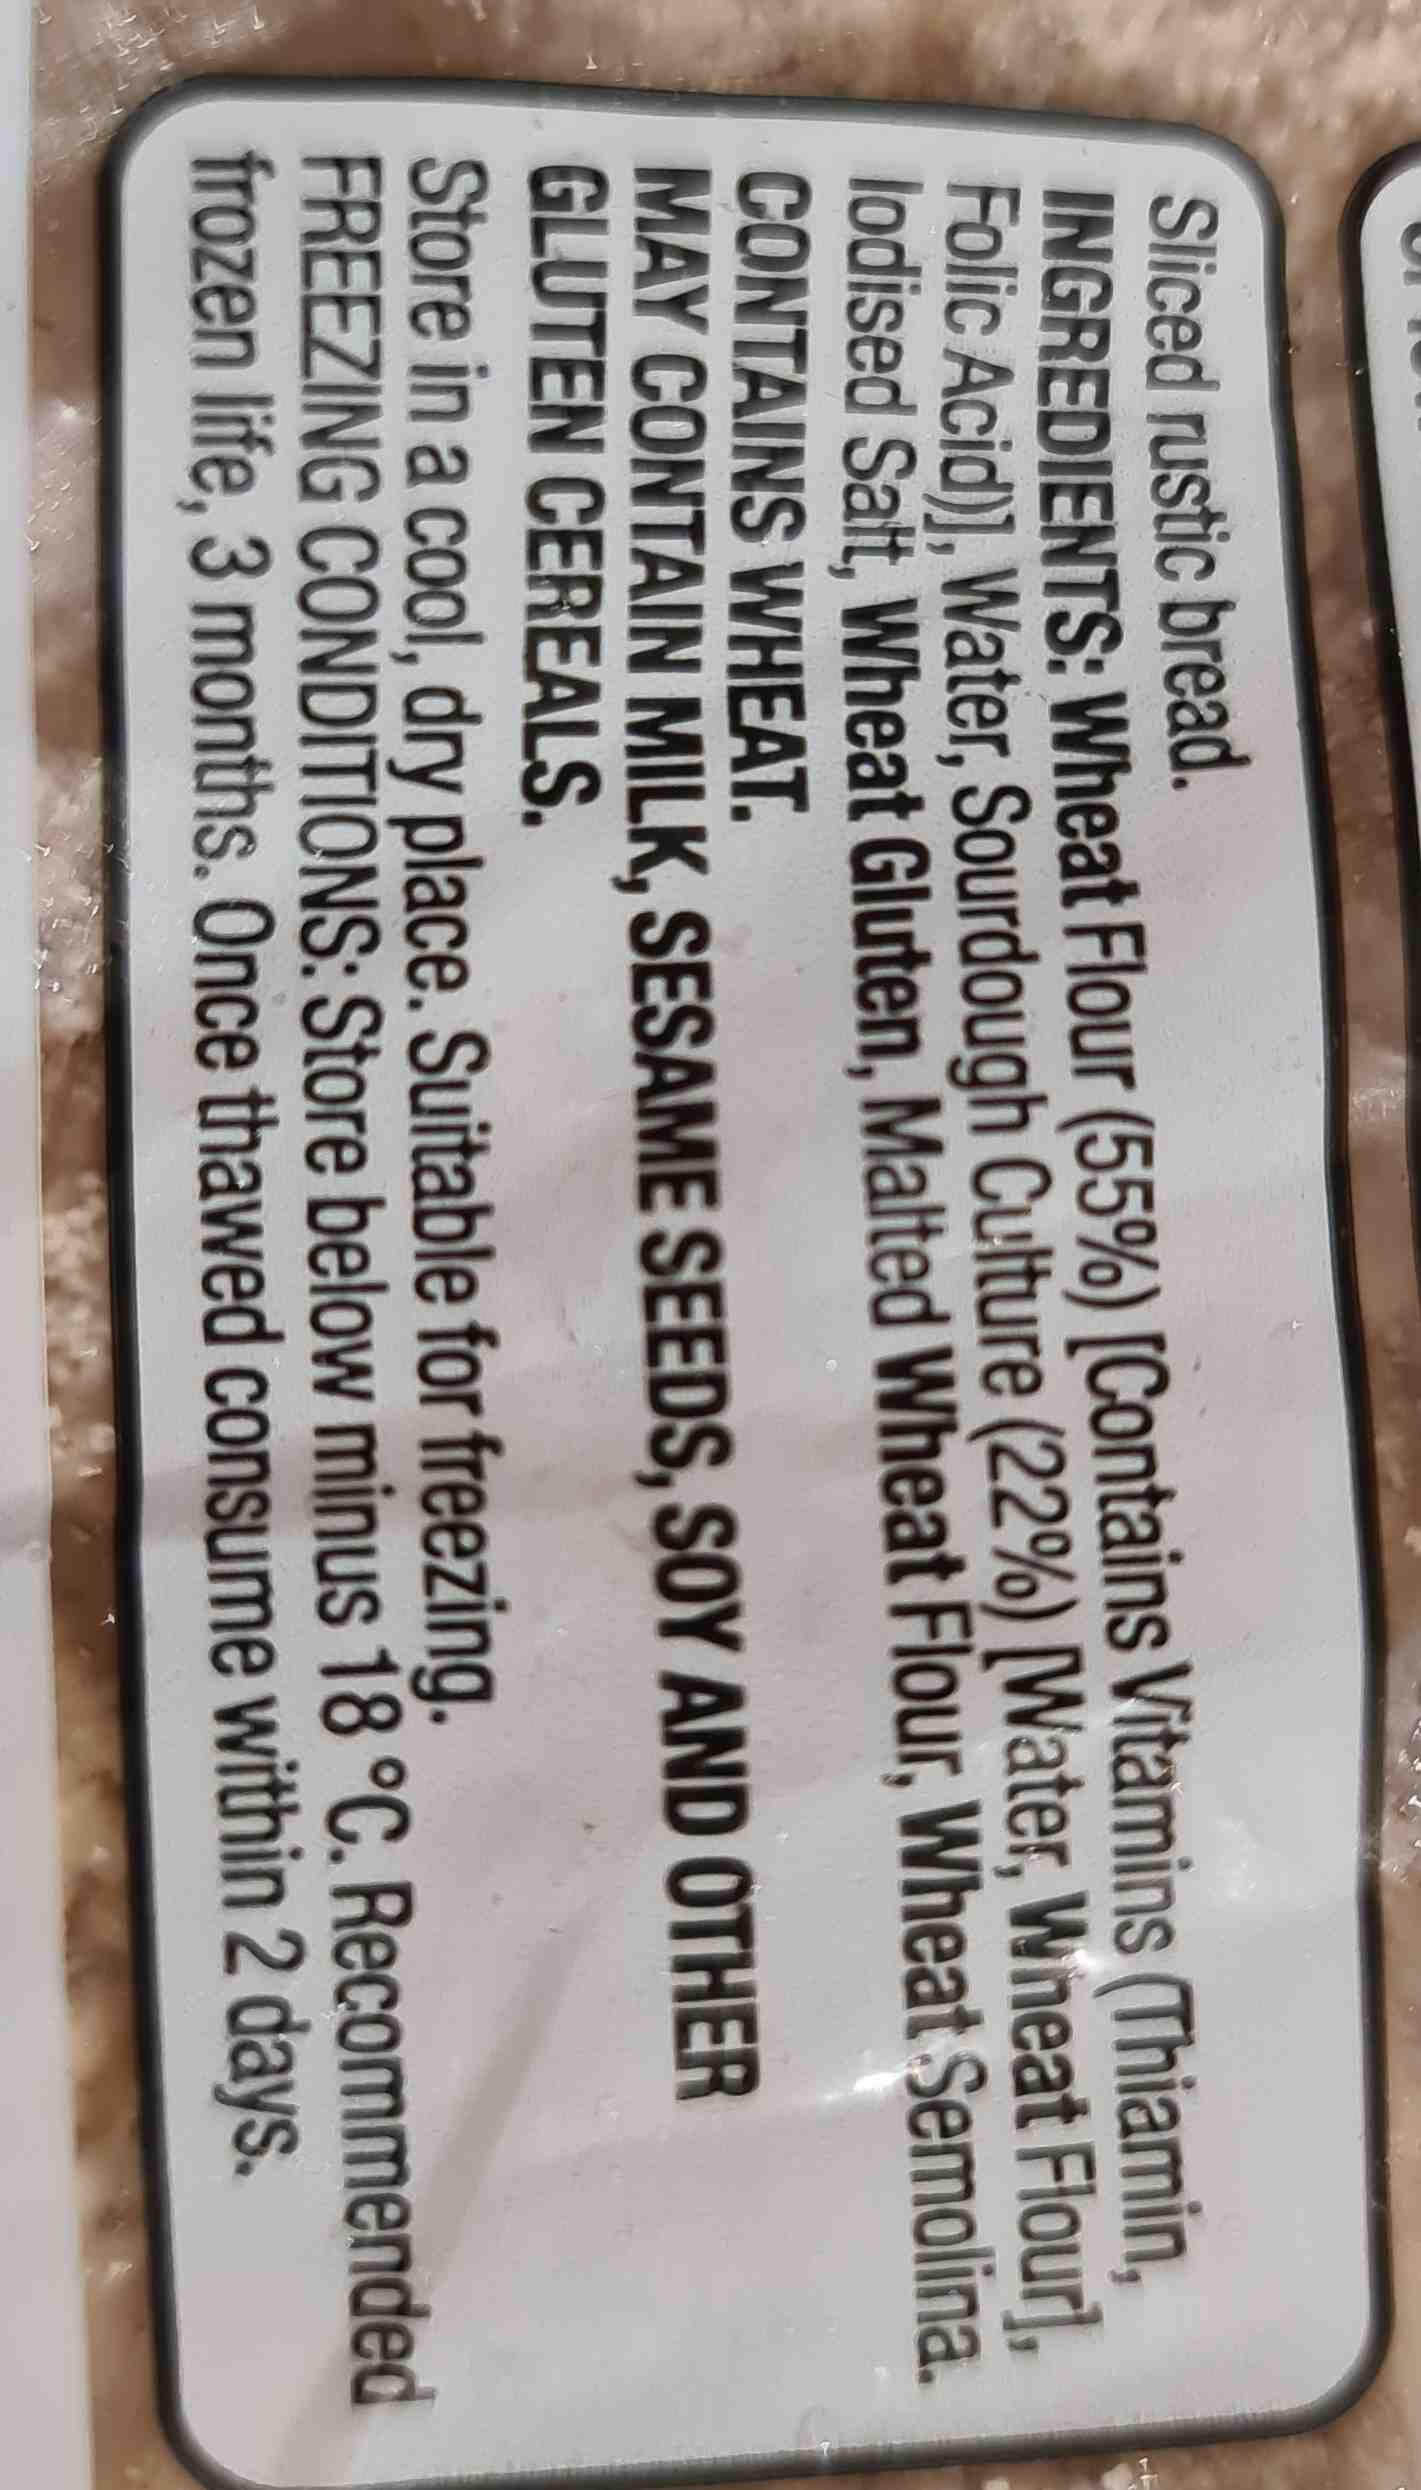 sourdough - Ingredients - en